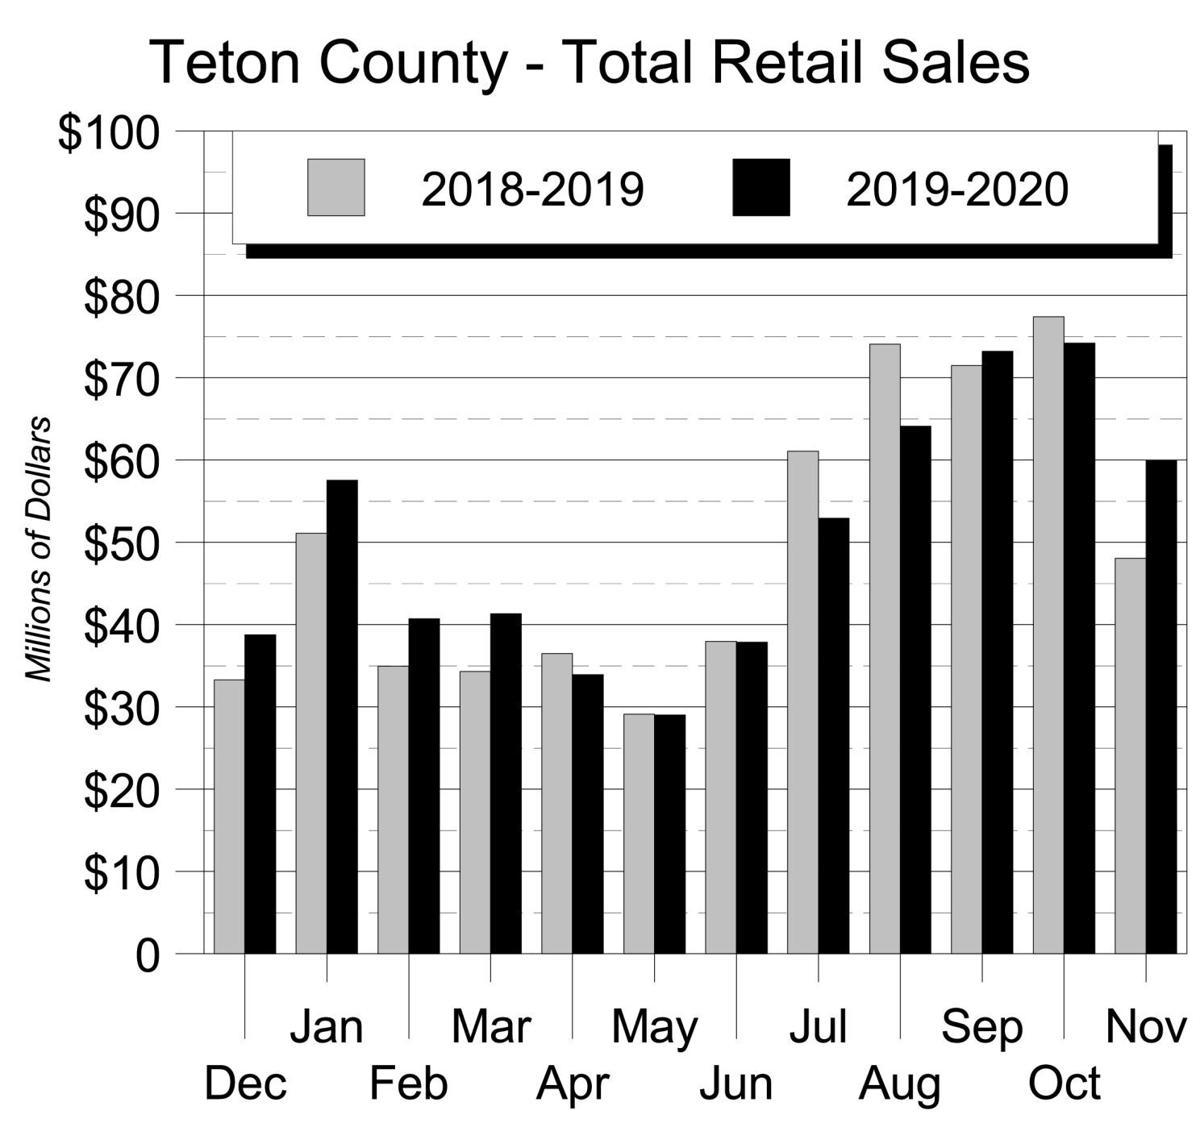 Teton County - Total Retail Sales